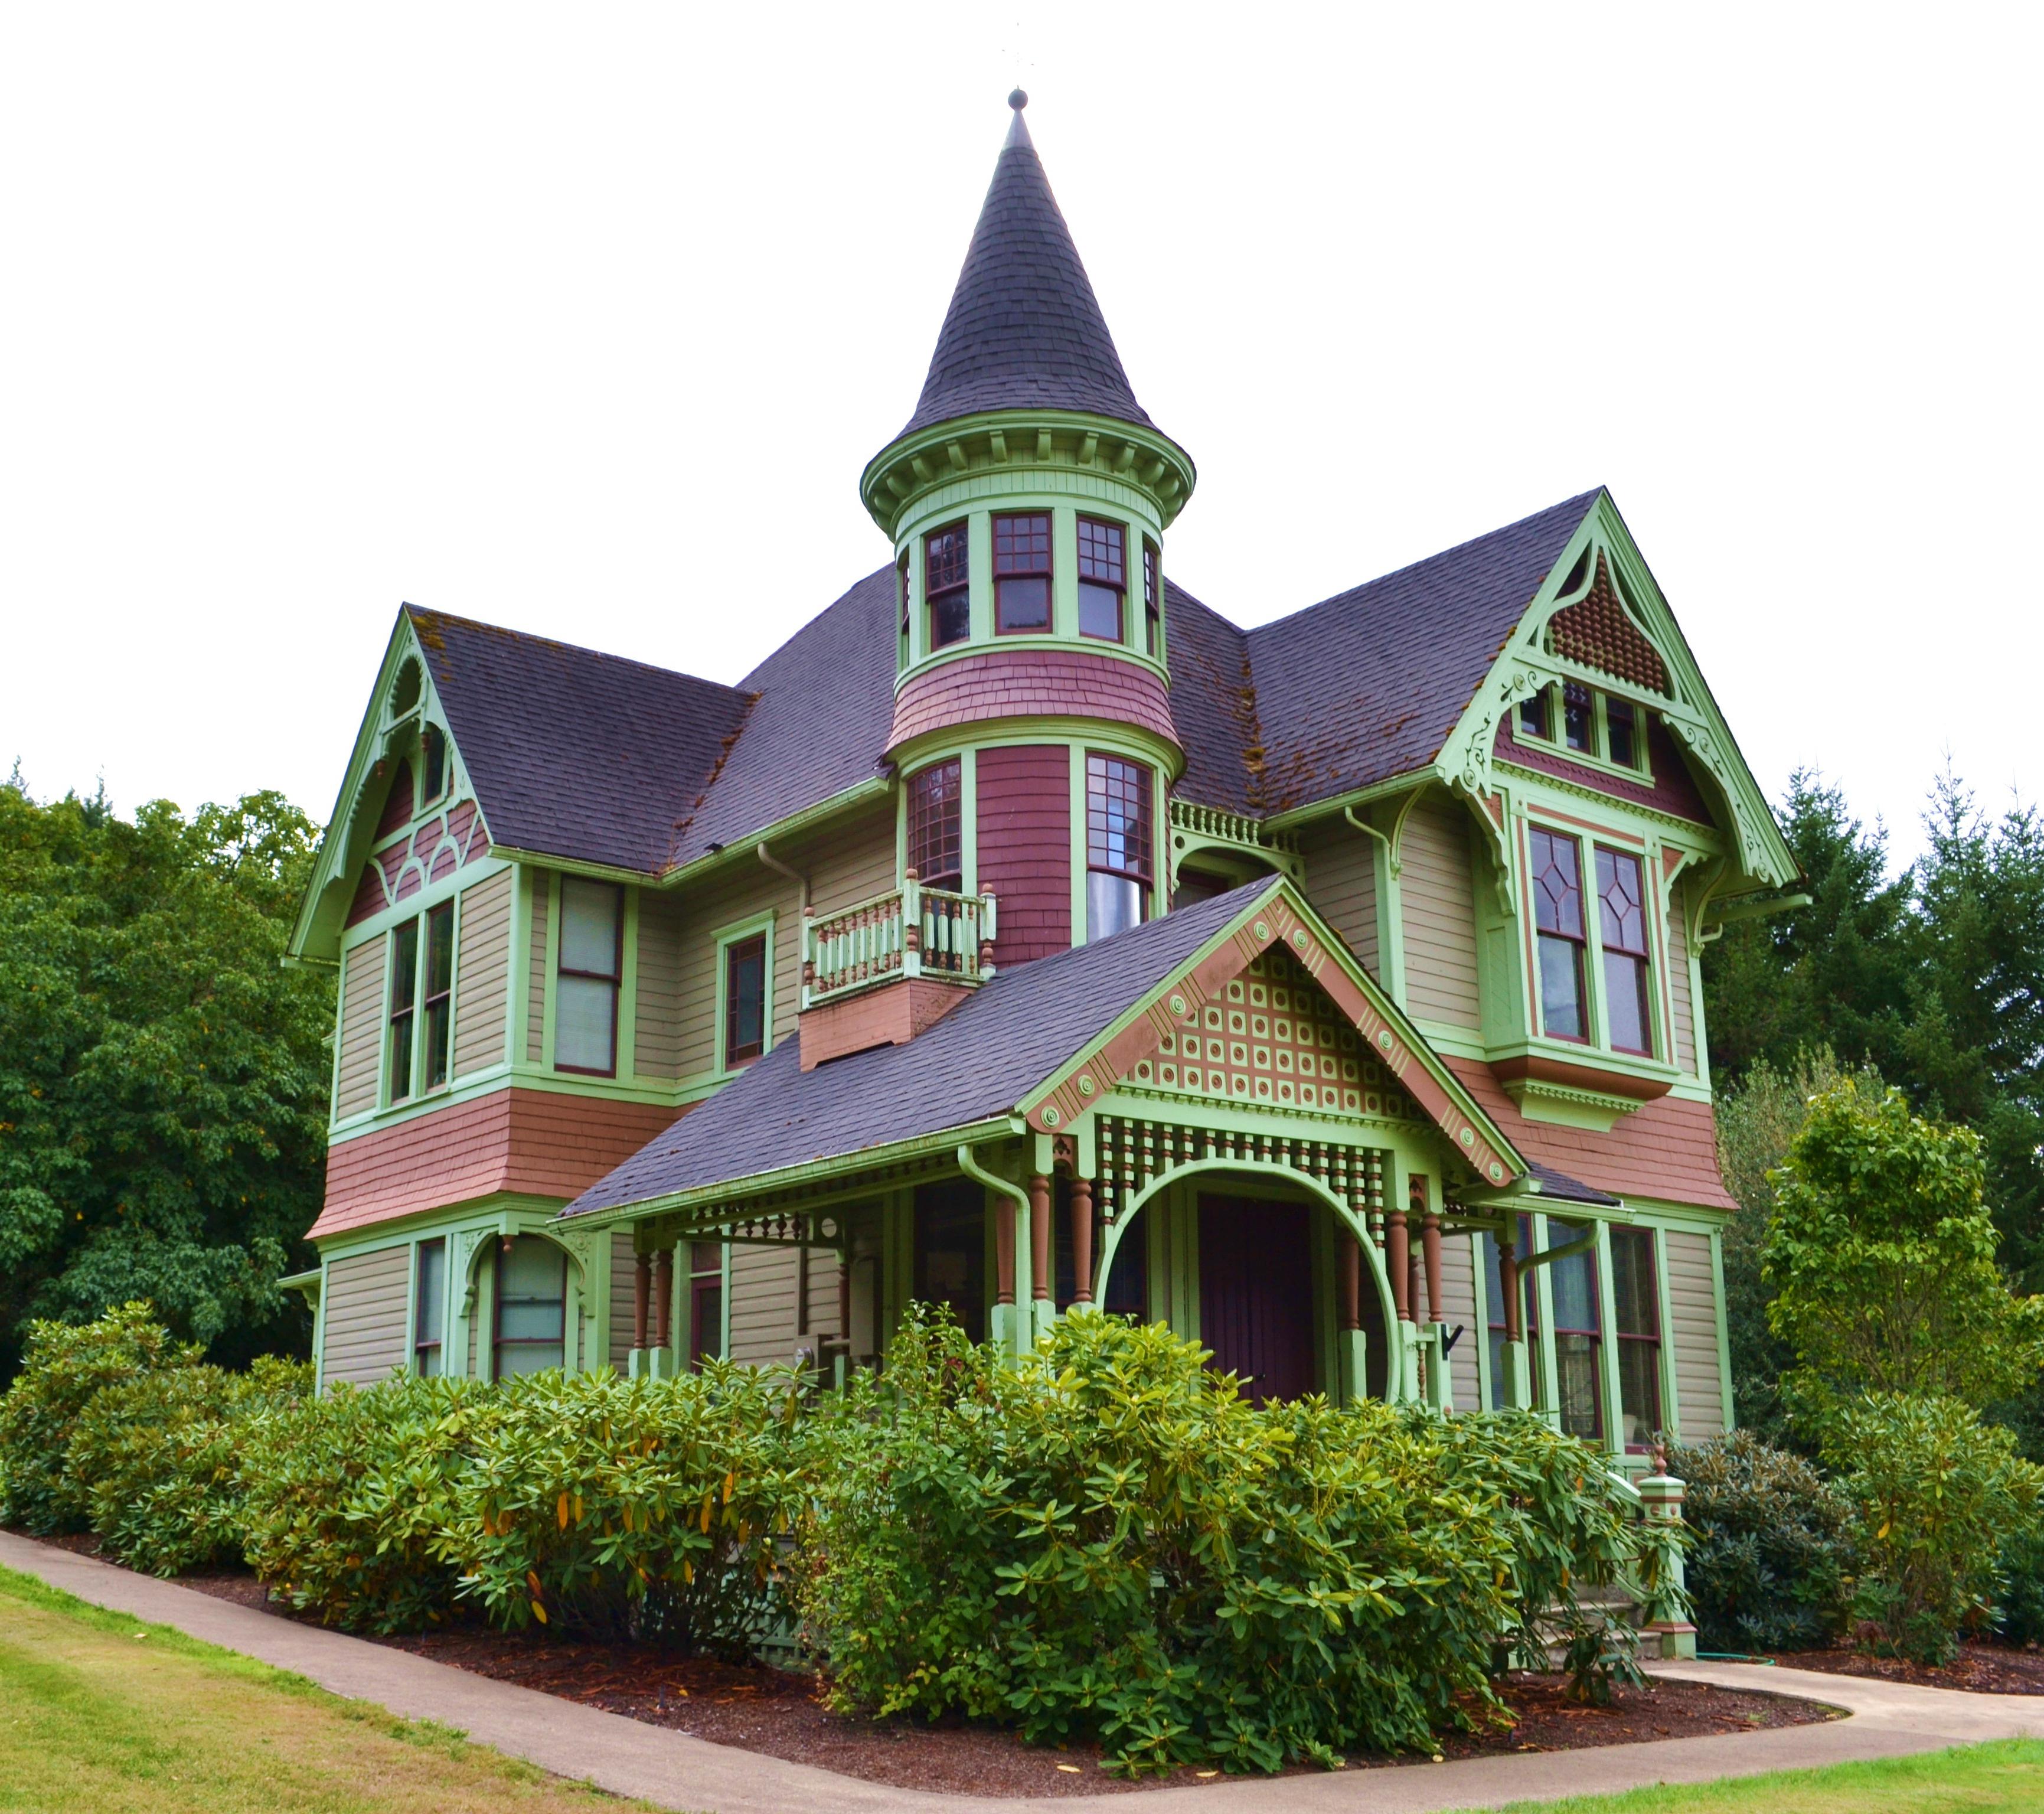 File:Charles And Anna Drain House (Drain, Oregon